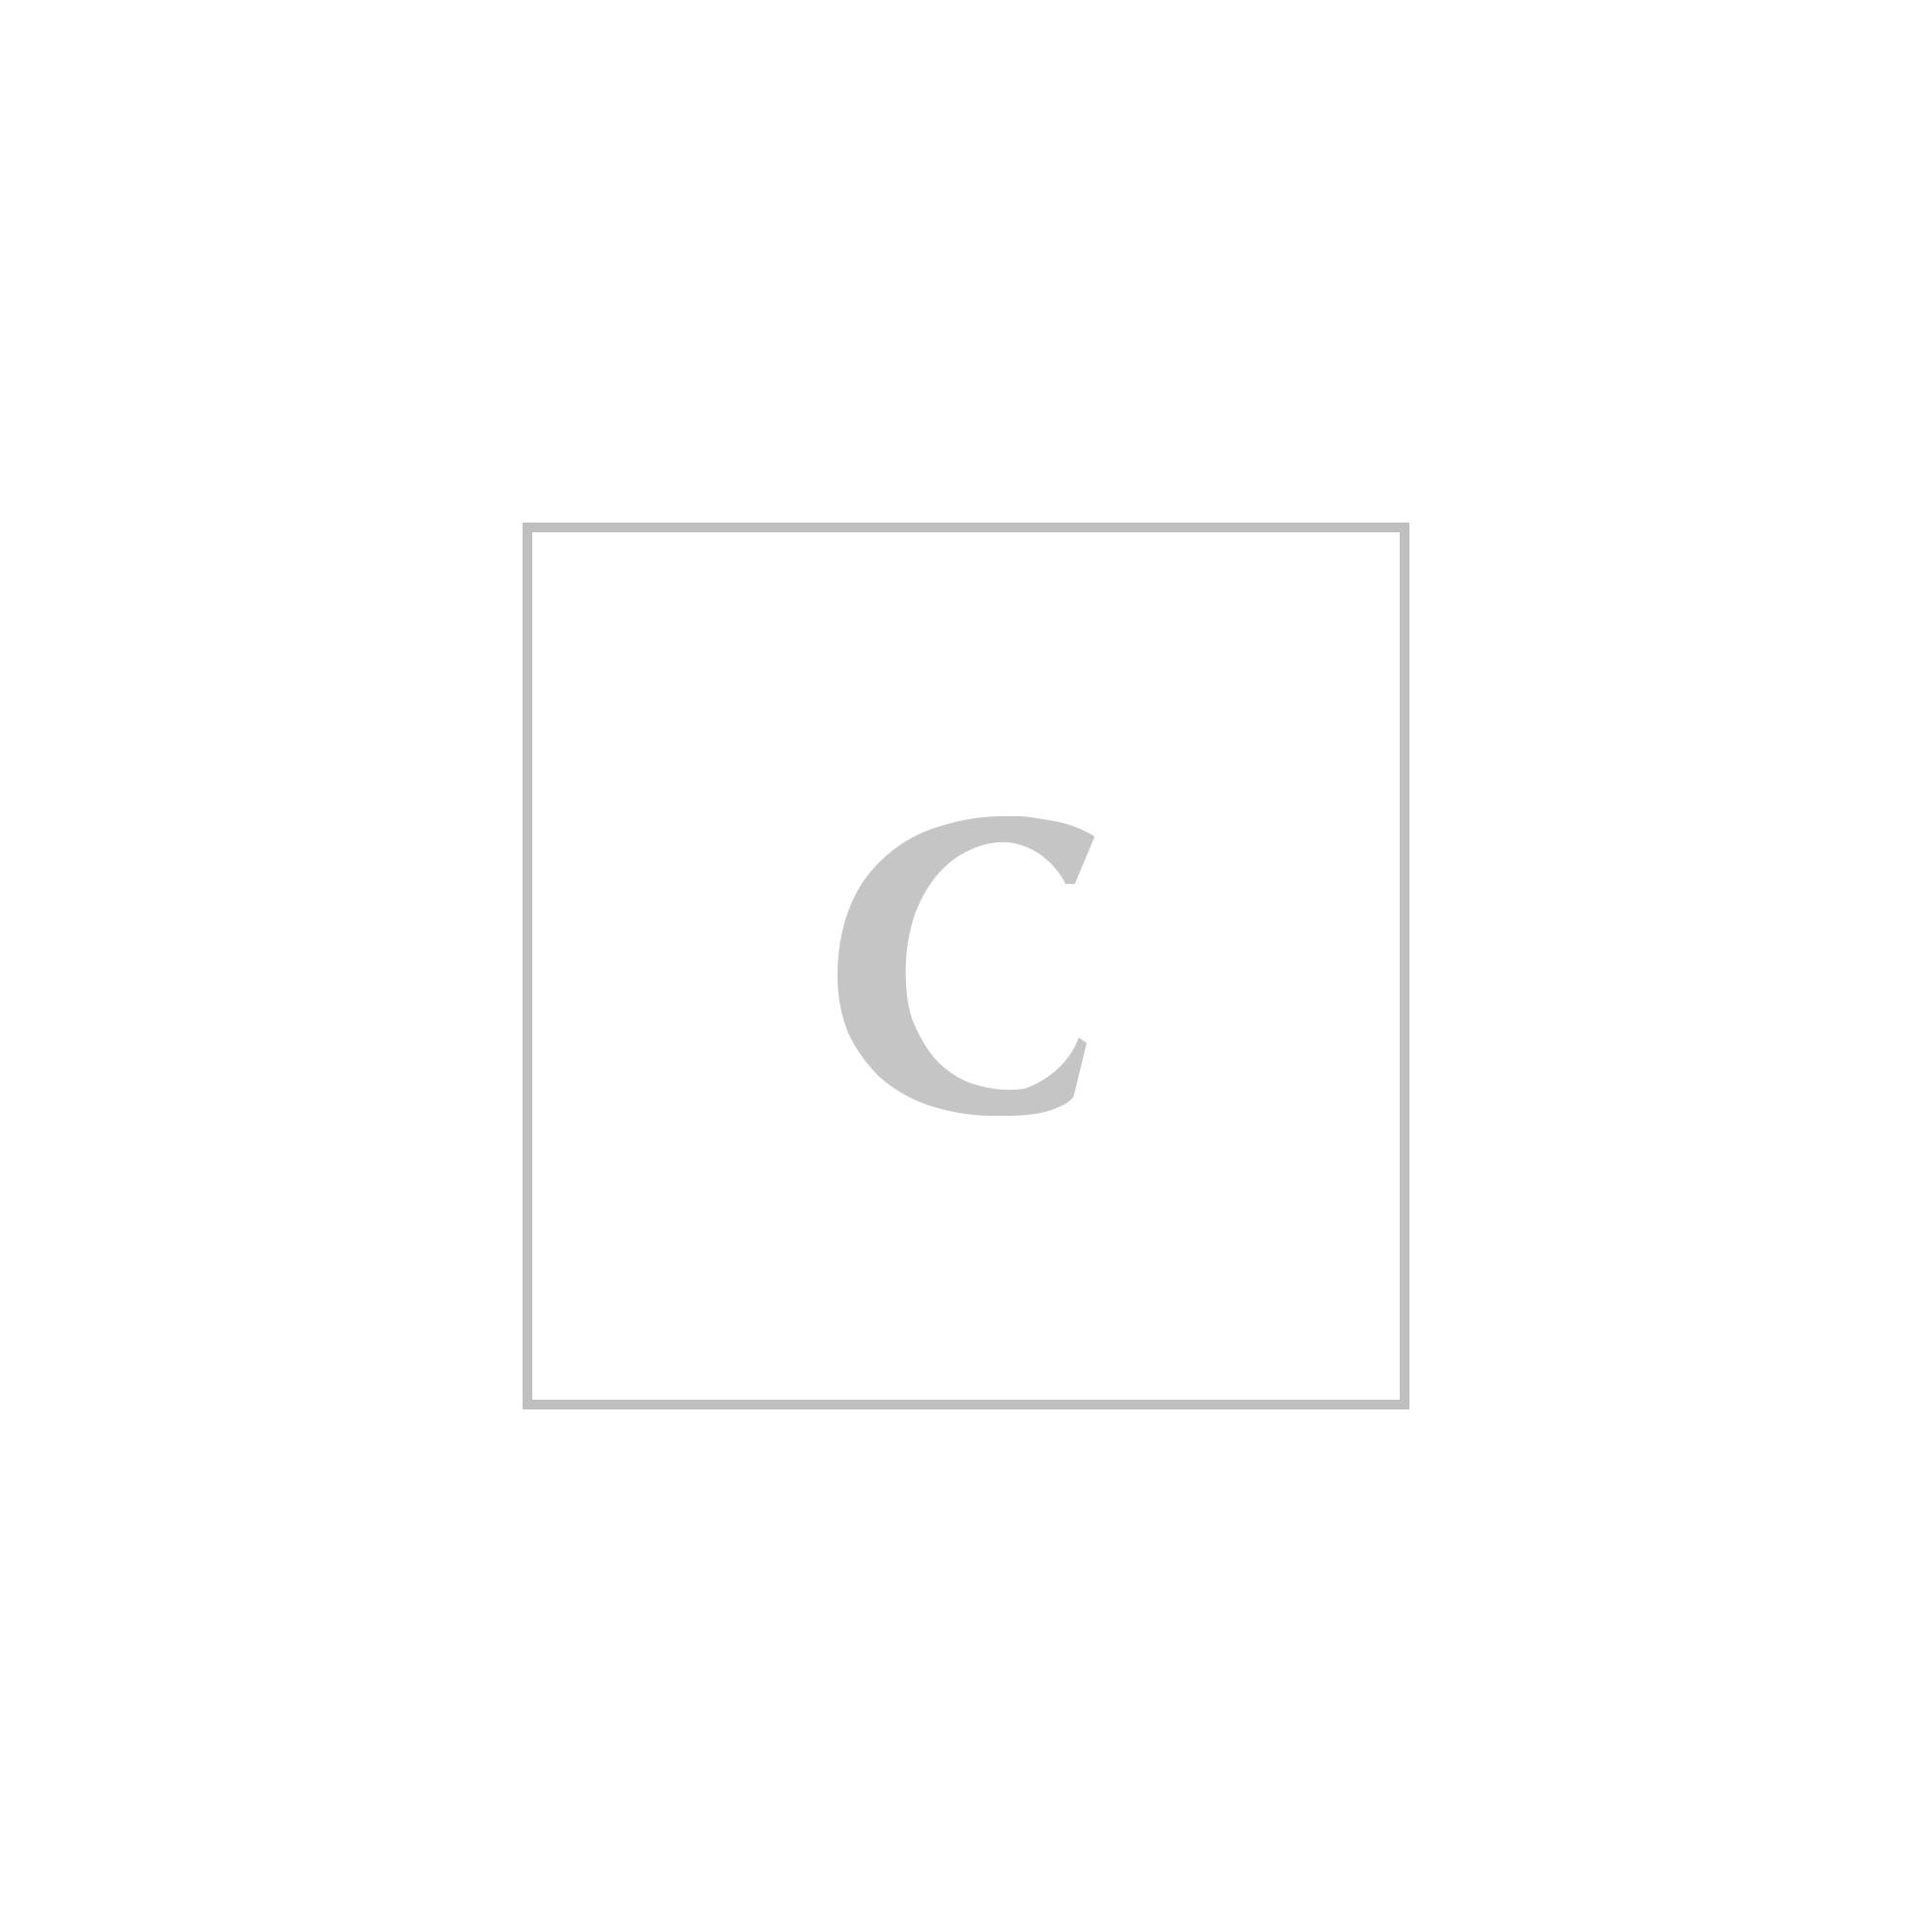 Dolce & gabbana decolletÉ pvc st. bianco/nero+v